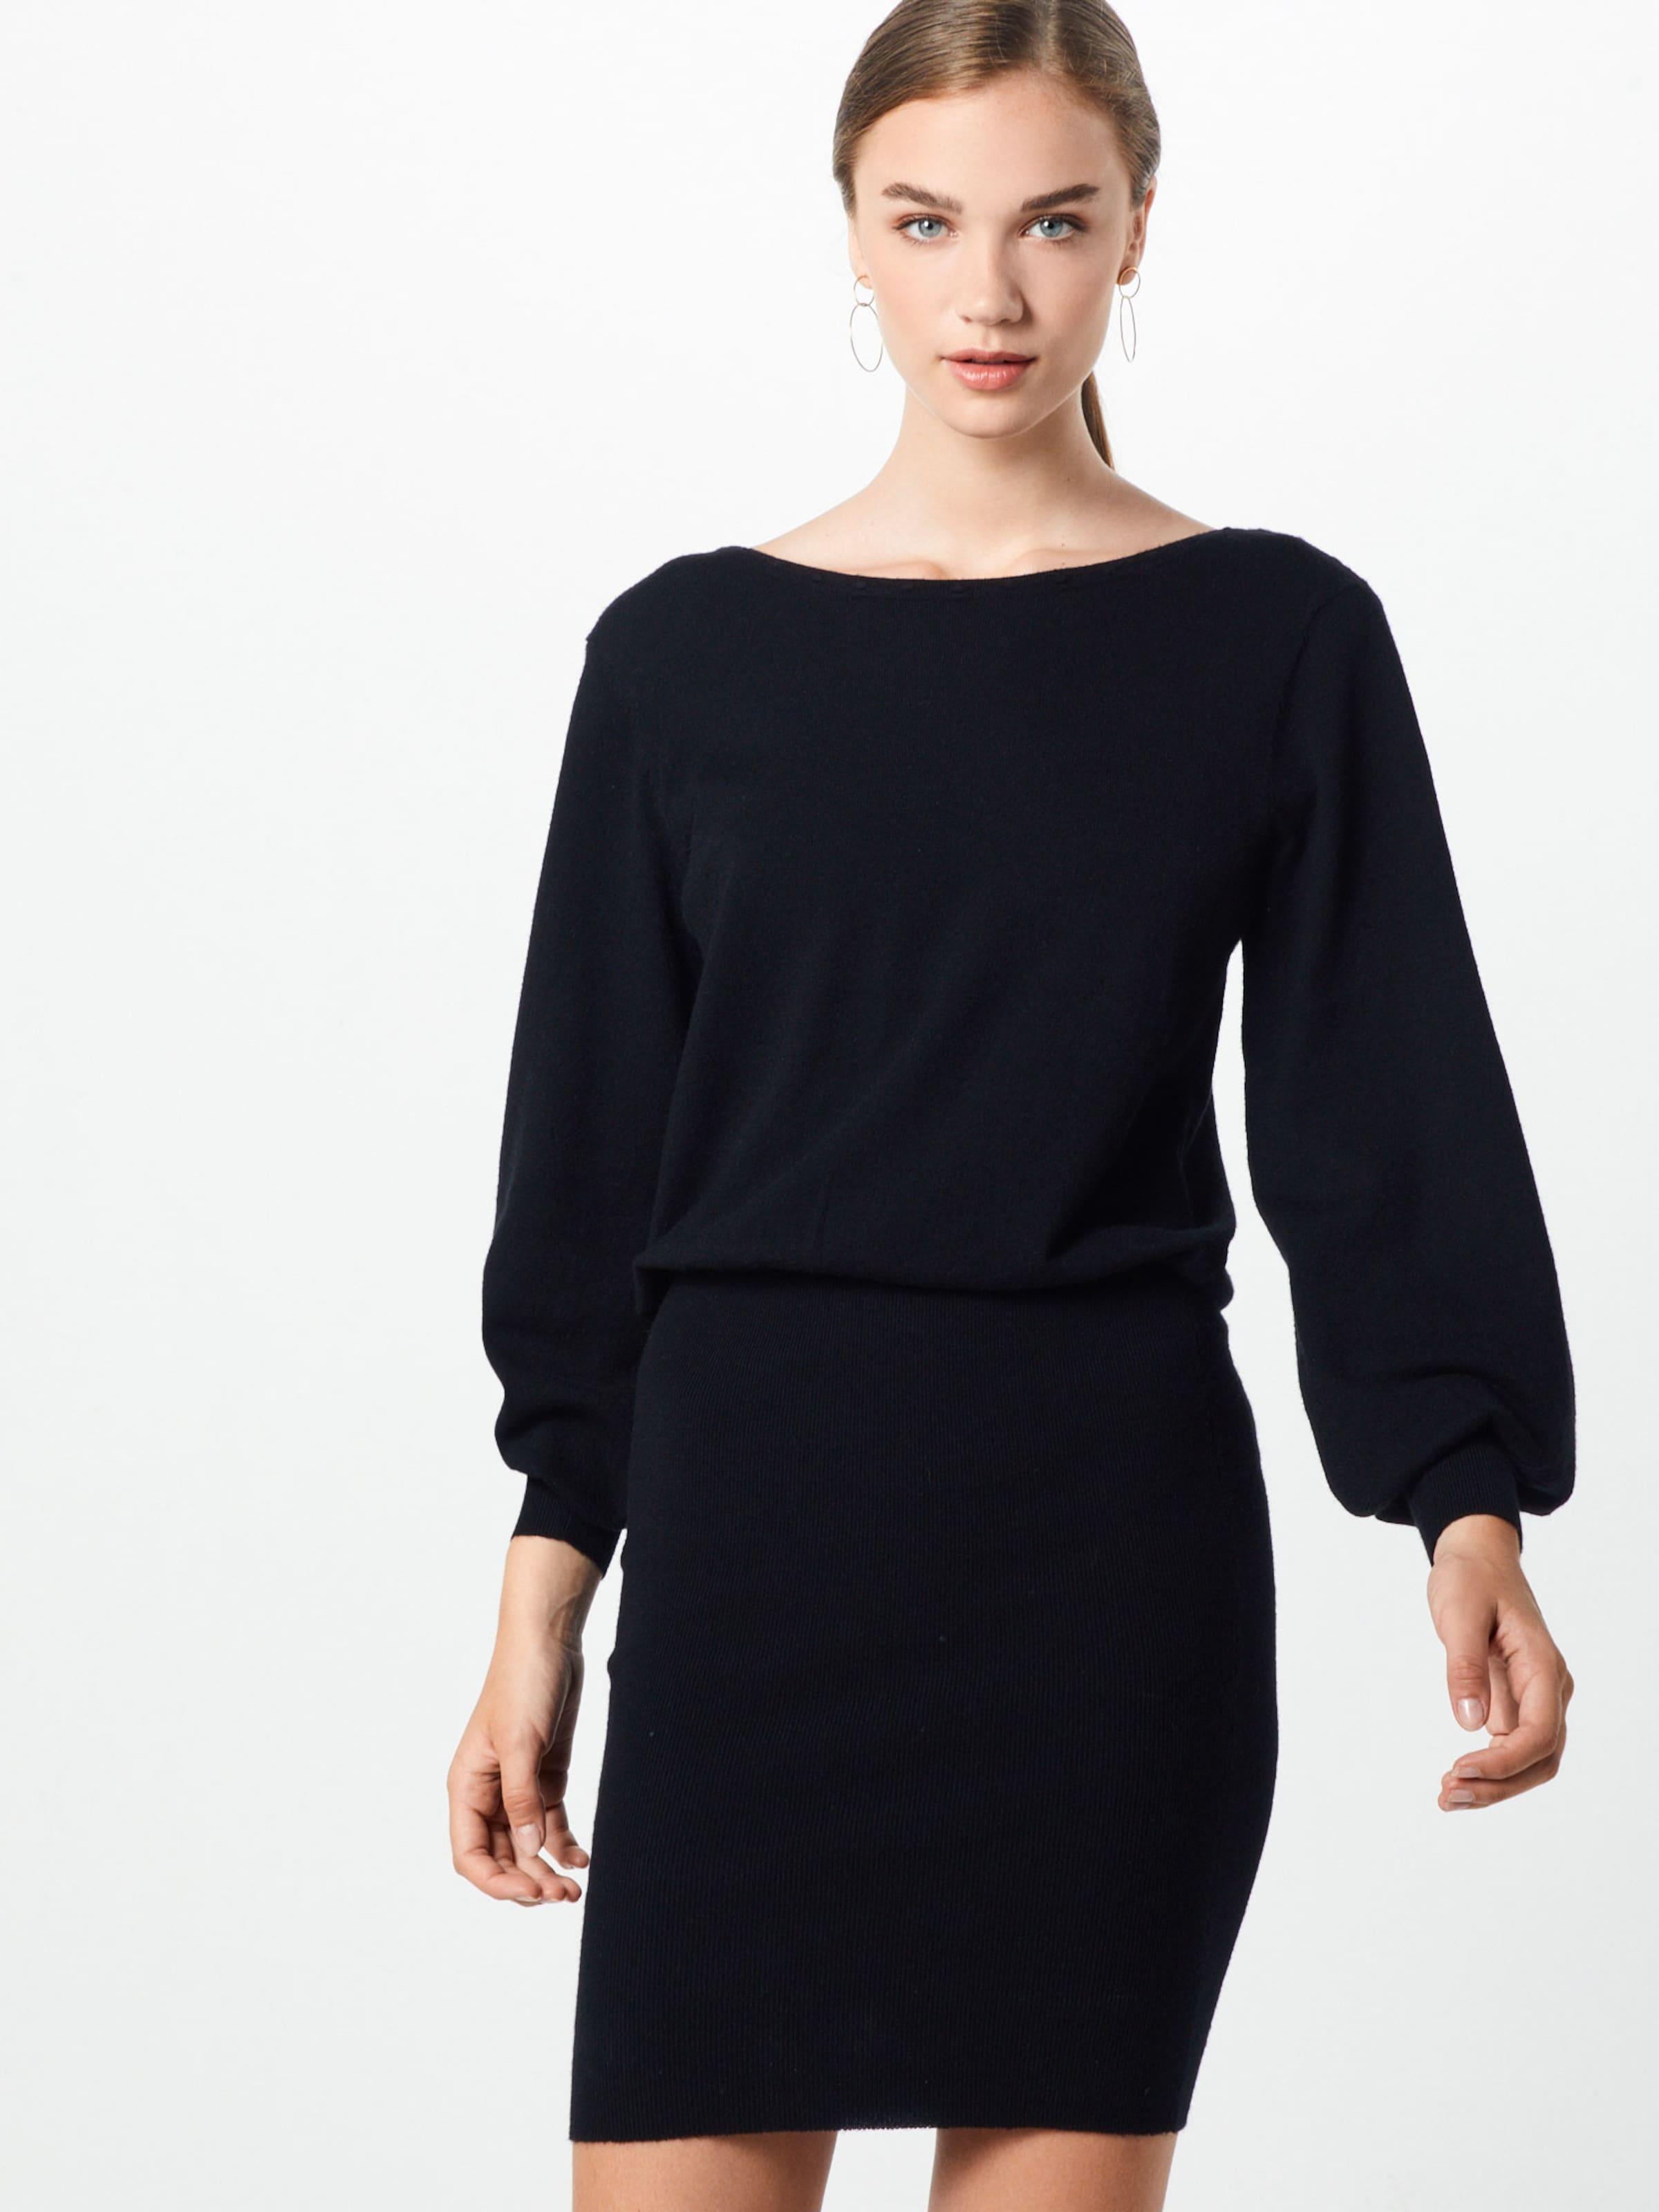 En Robes Maille Noir Vila 'visti' SMqpjUzGLV